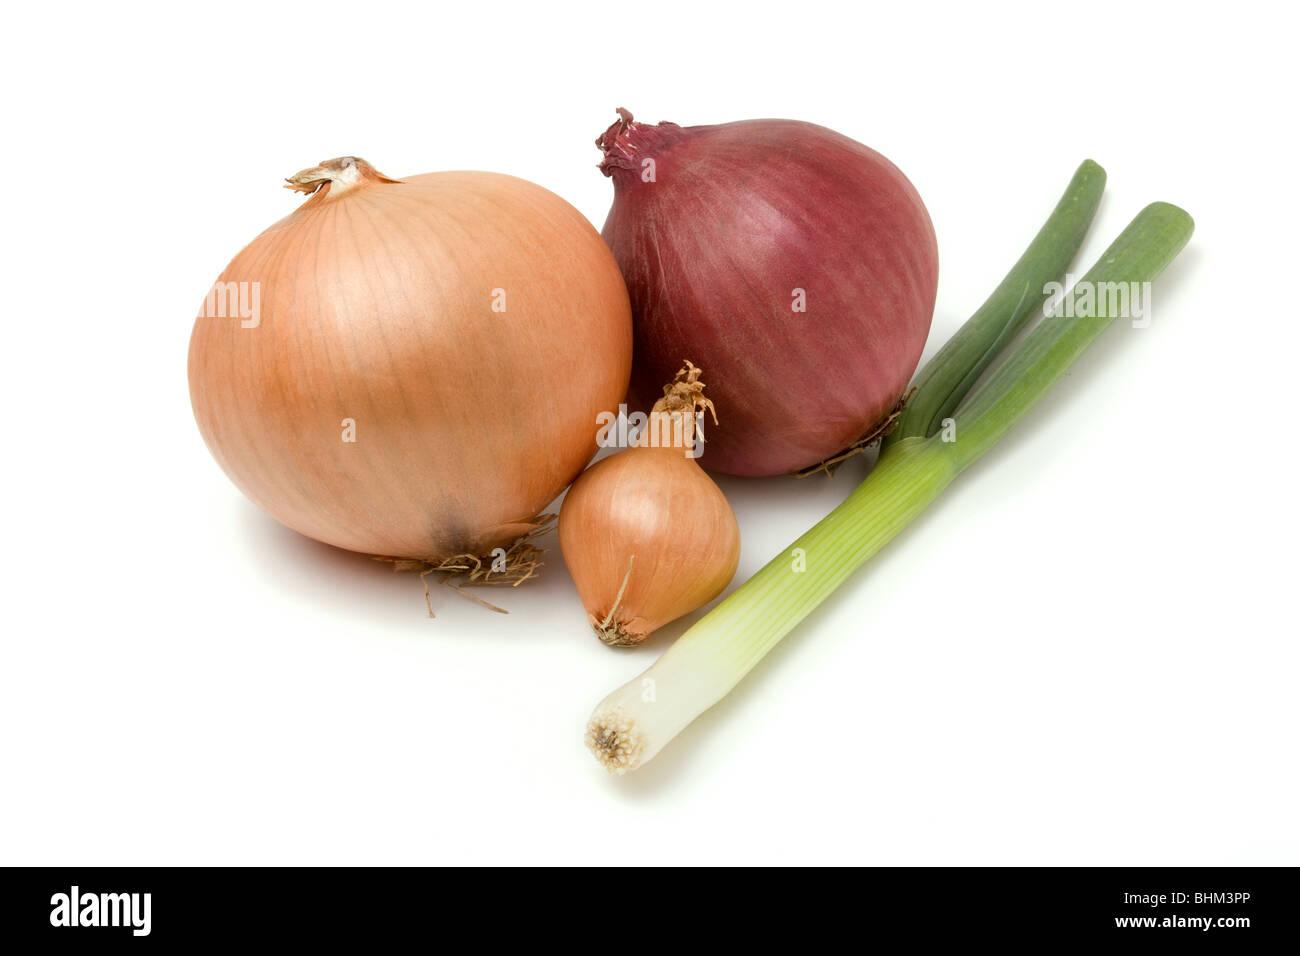 Onion Family Stock Photos Onion Family Stock Images Alamy